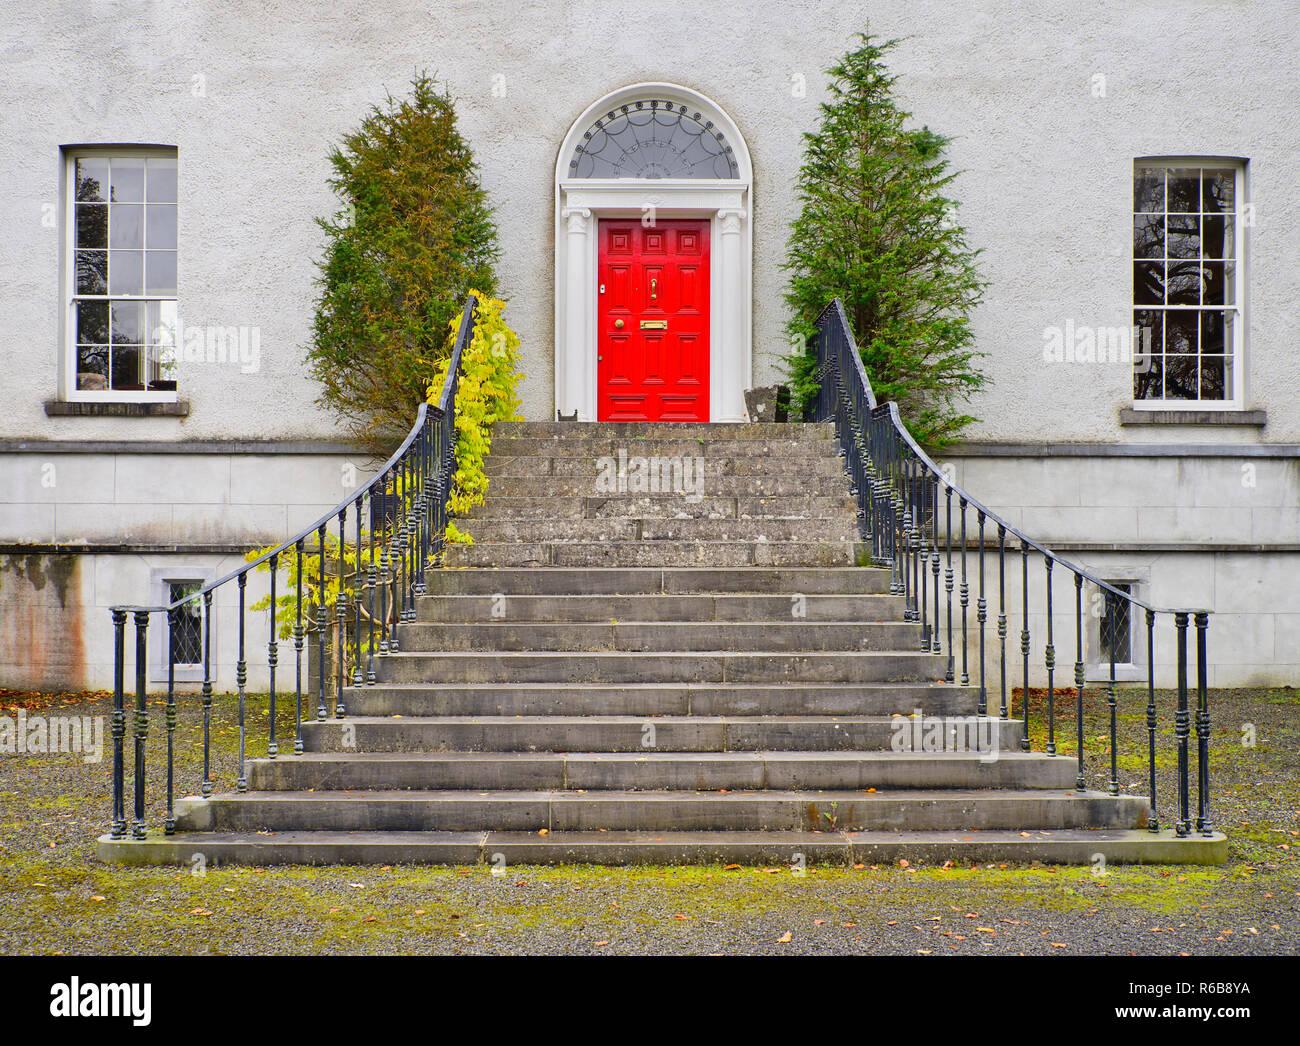 Ireland County Roscommon Castlecoote House 18th Century Georgian